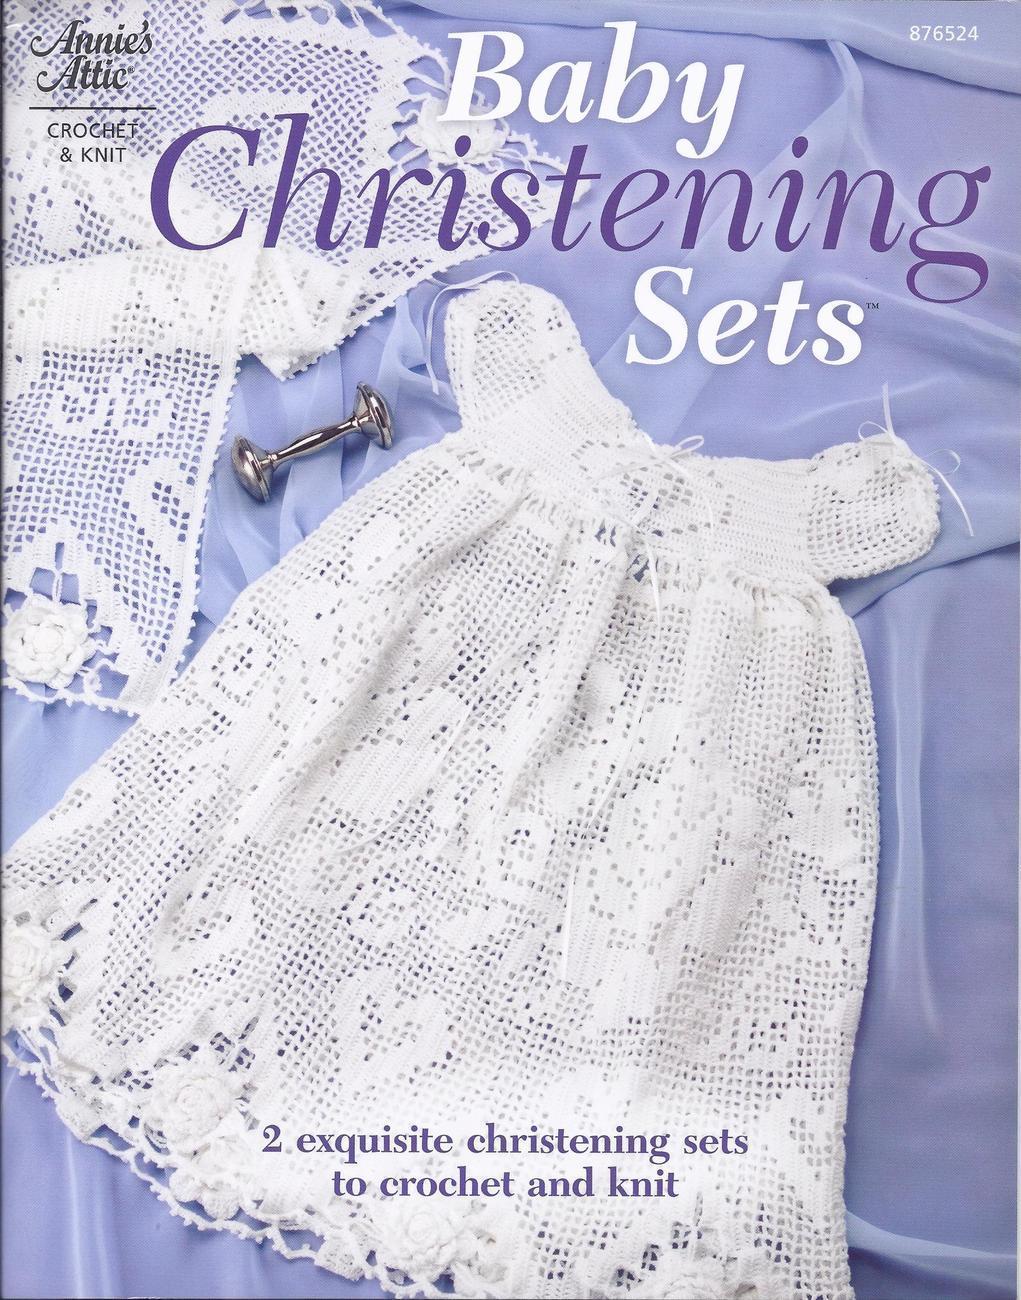 Free Crochet Pattern Leaflets : 2 Exquisite Christening Sets to Crochet & Knit Pattern ...